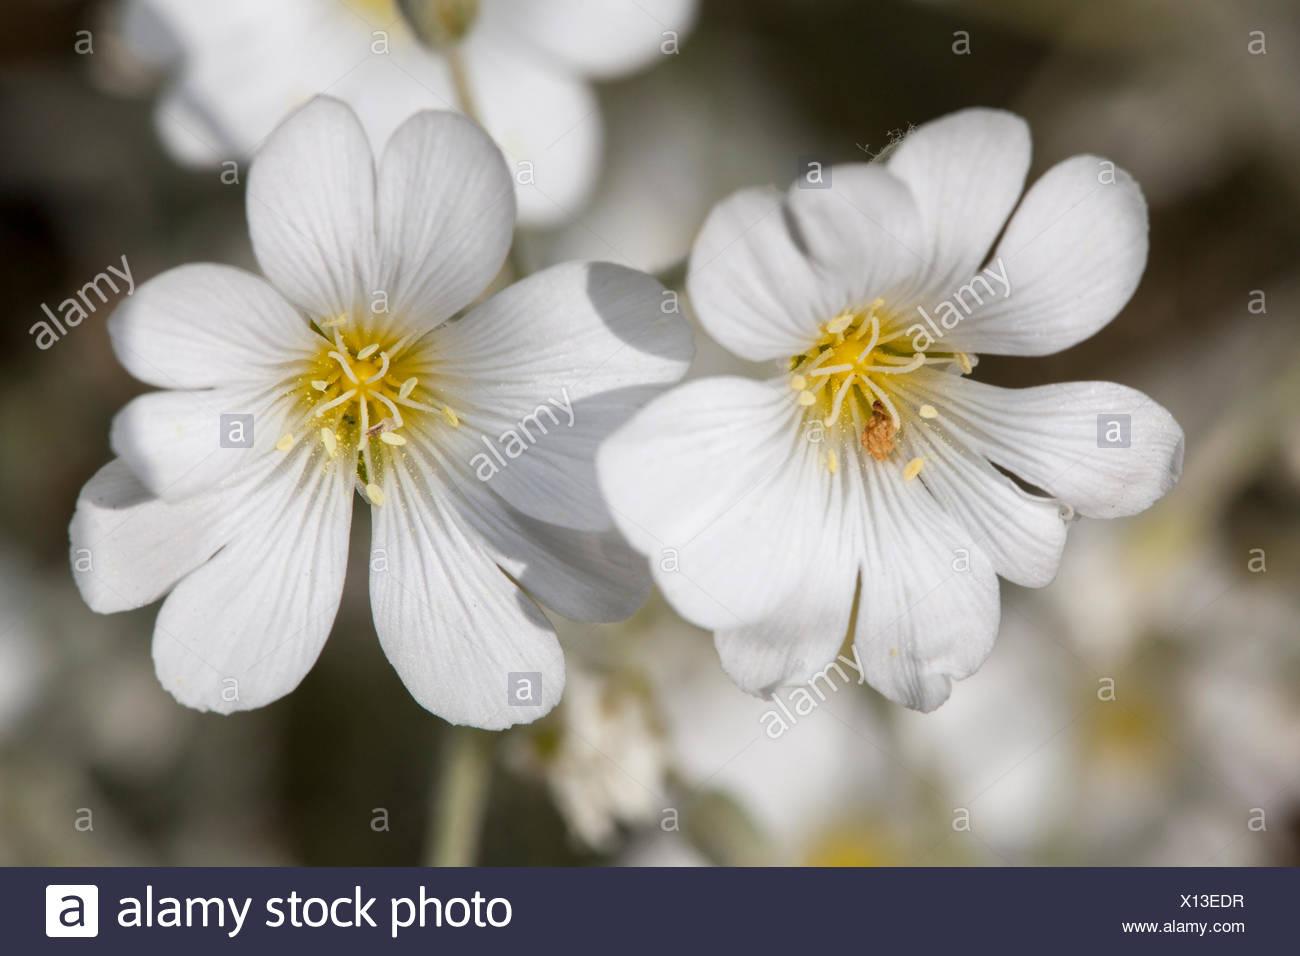 White flowers of a Snow-in-Summer plant (Cerastium tomentosum) - Stock Image